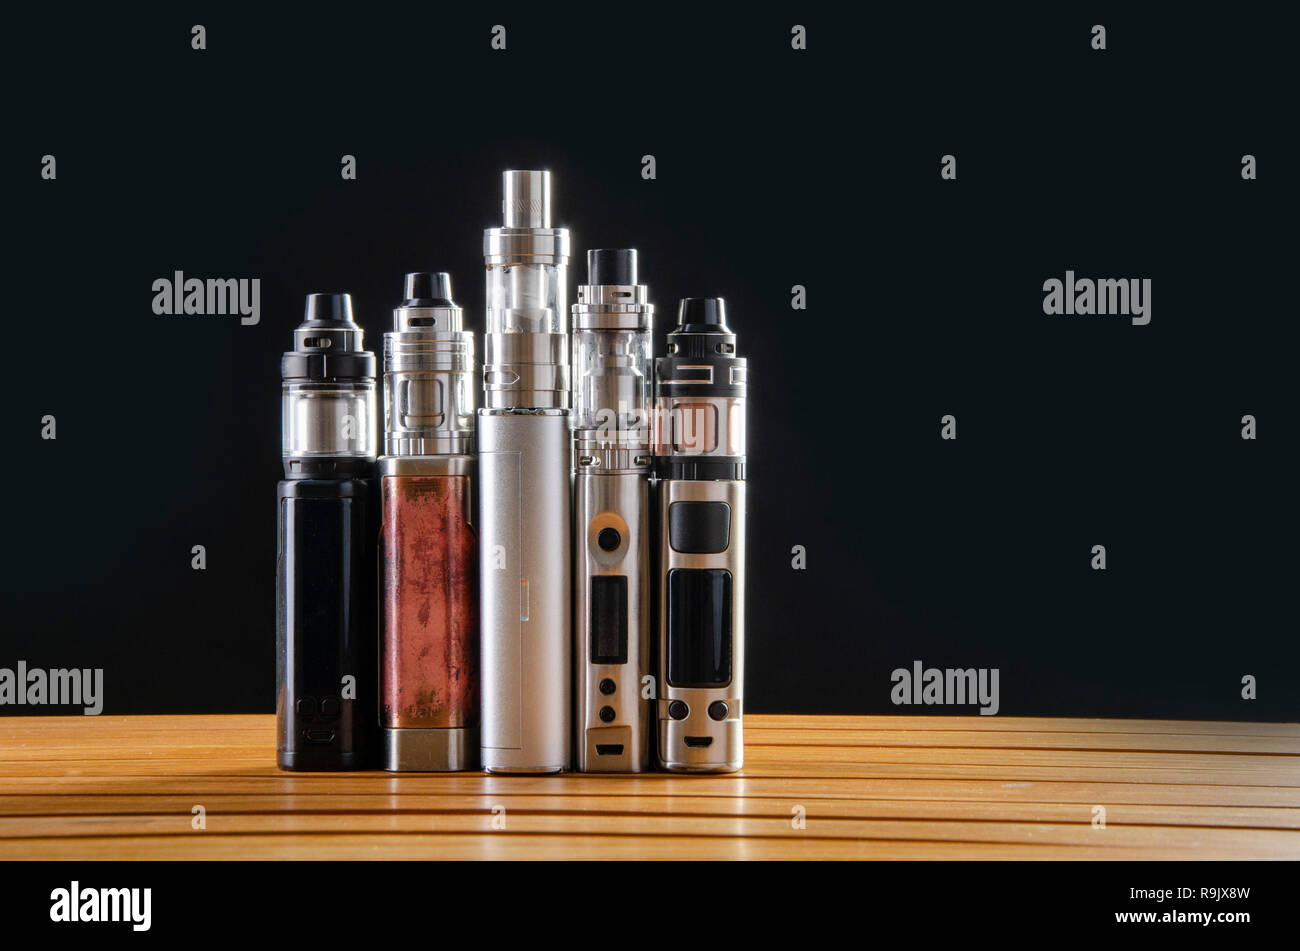 Popular vaping e cig devices mod.electronic cigarette over wooden background. vaporizer e-cig old device model. - Stock Image